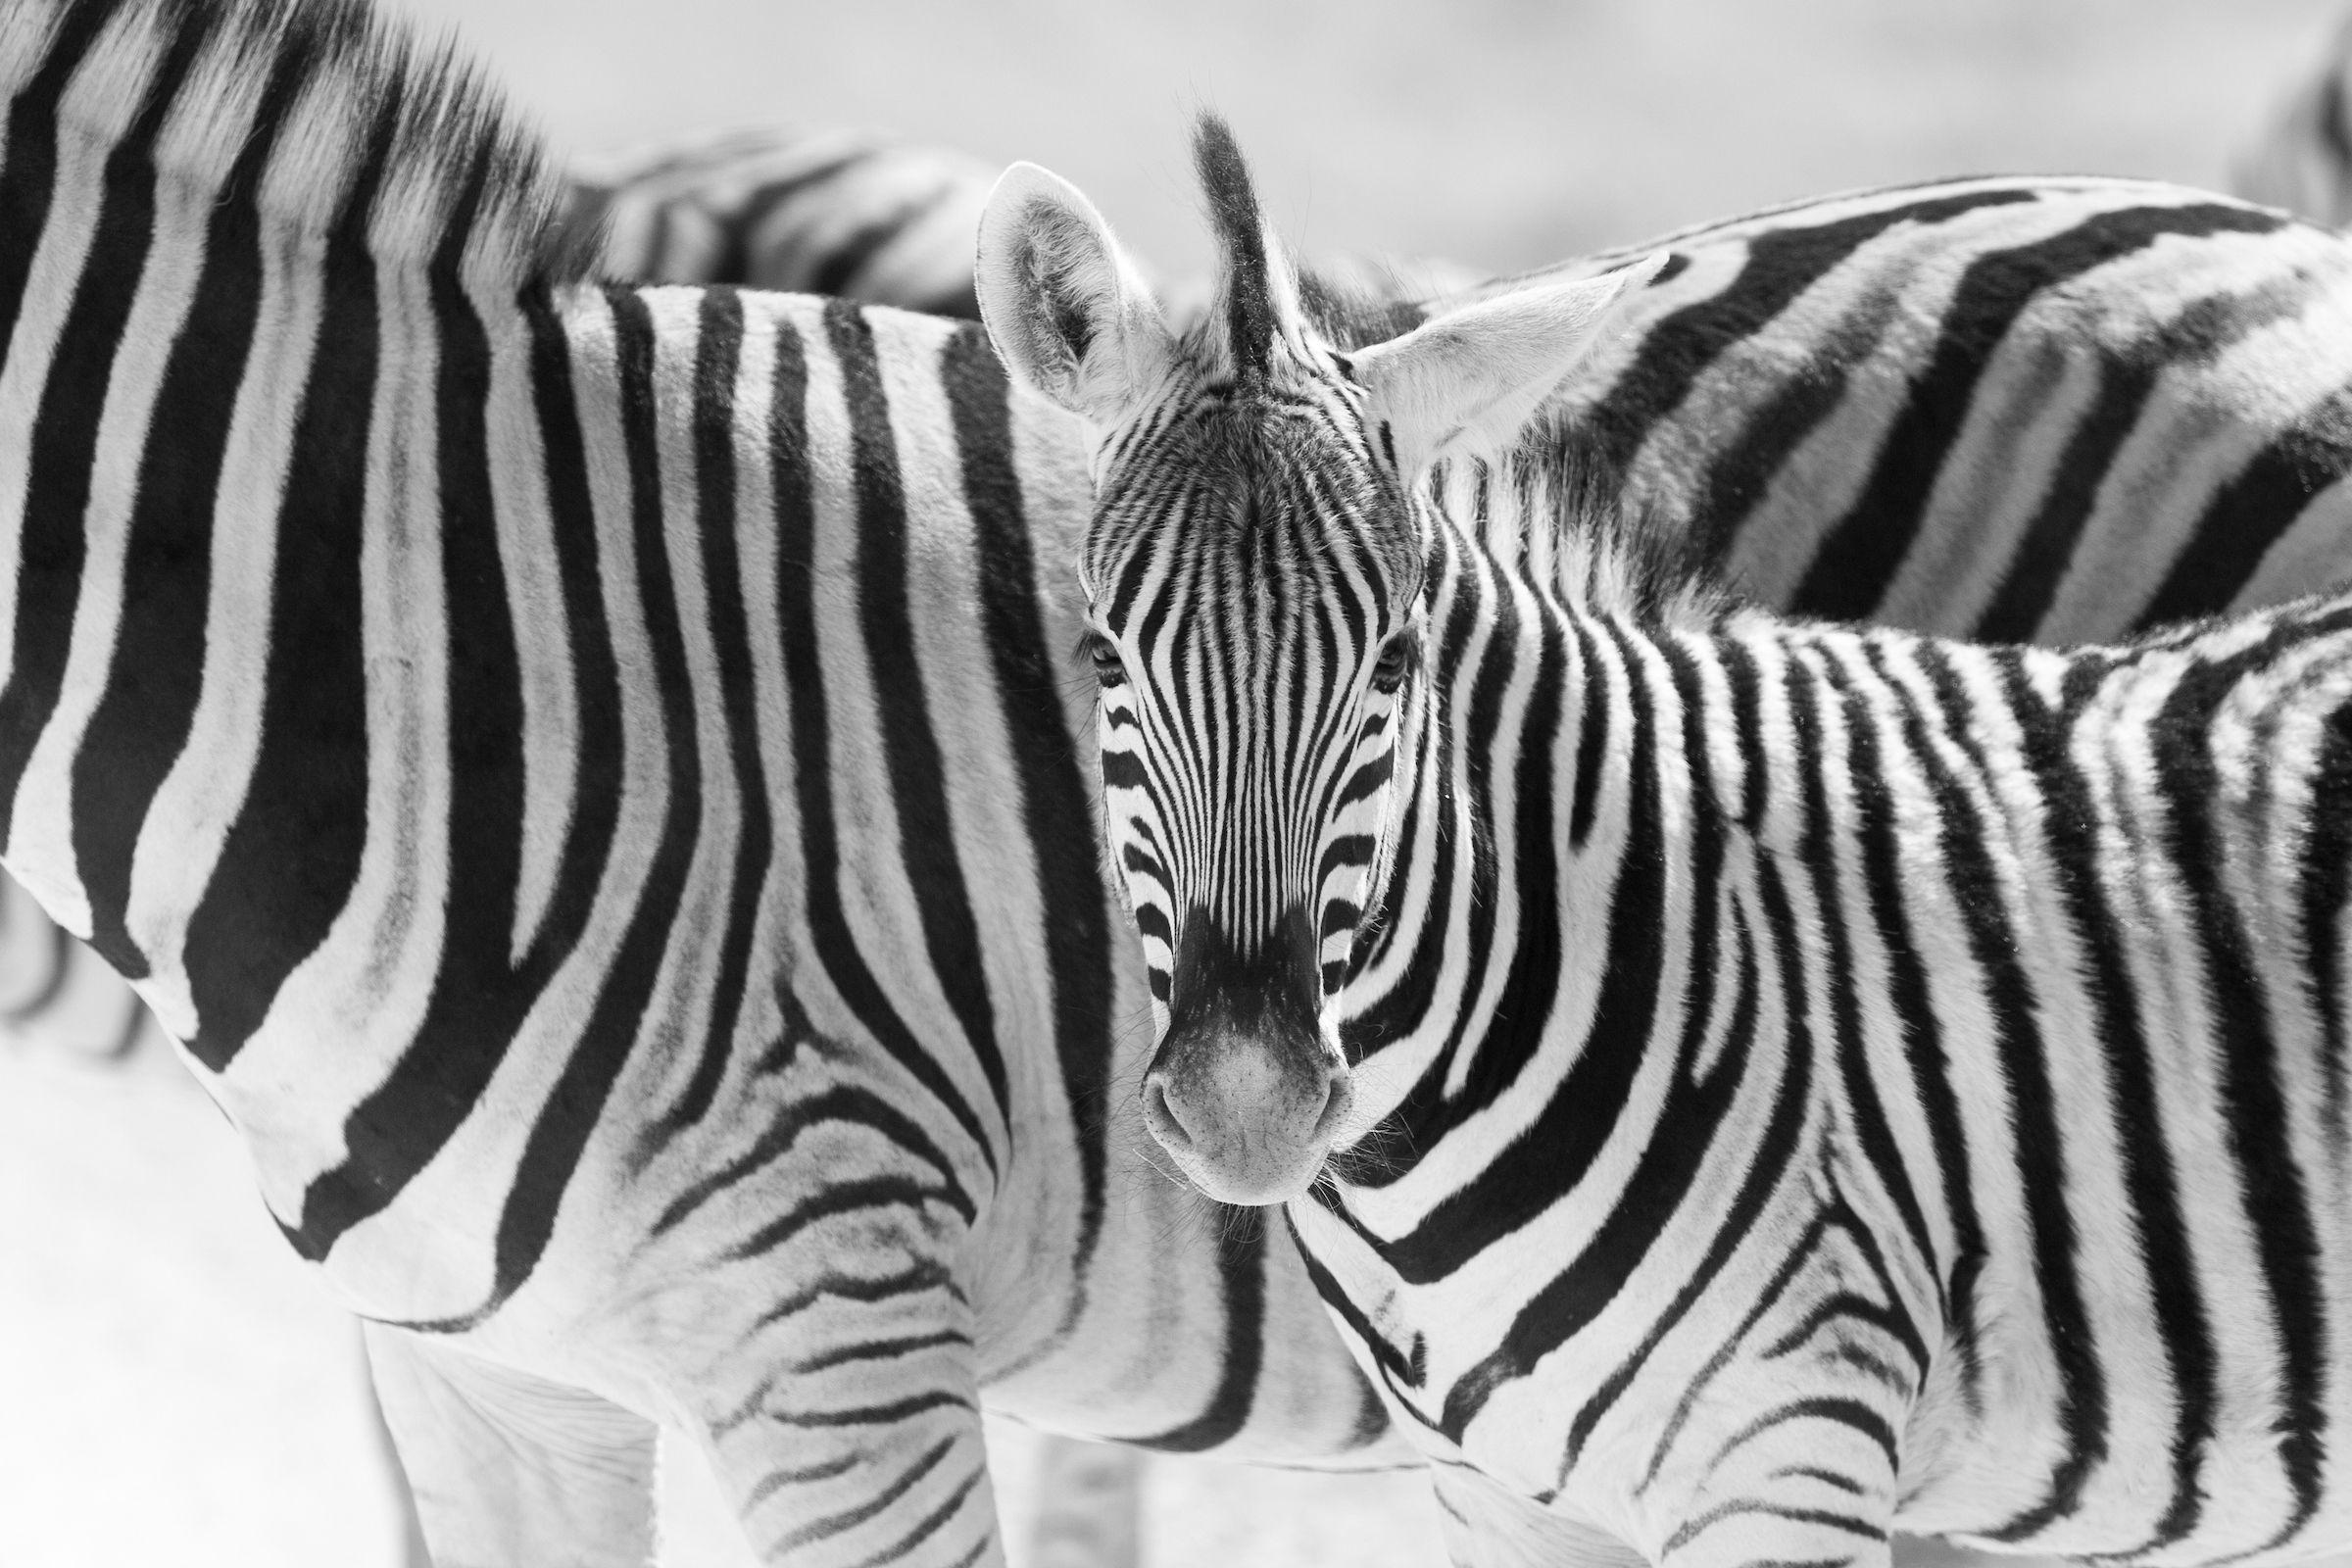 Burchell's Zebras in Etosha